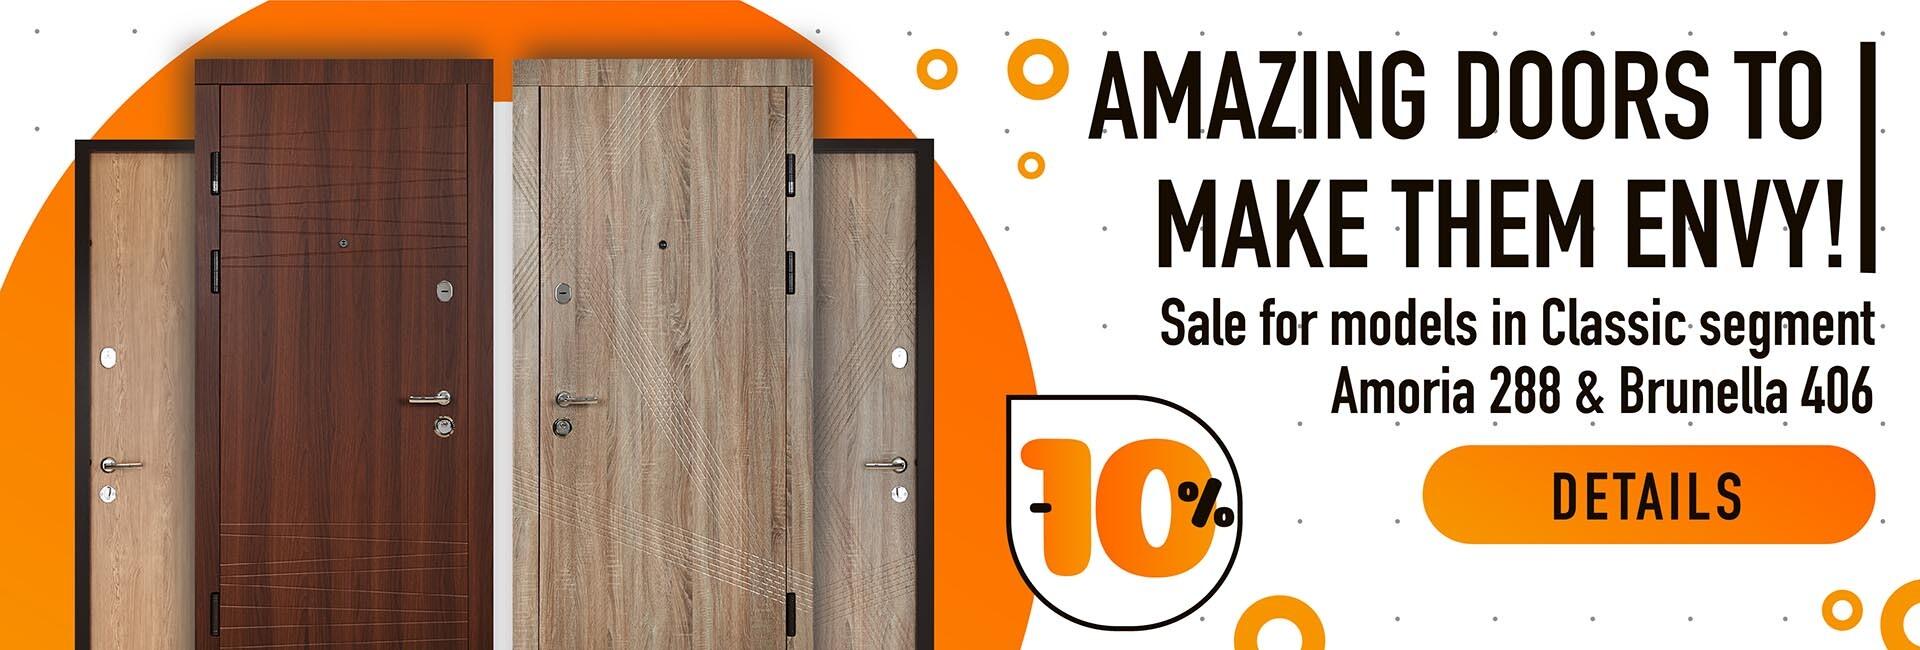 Amazing doors to make them envy